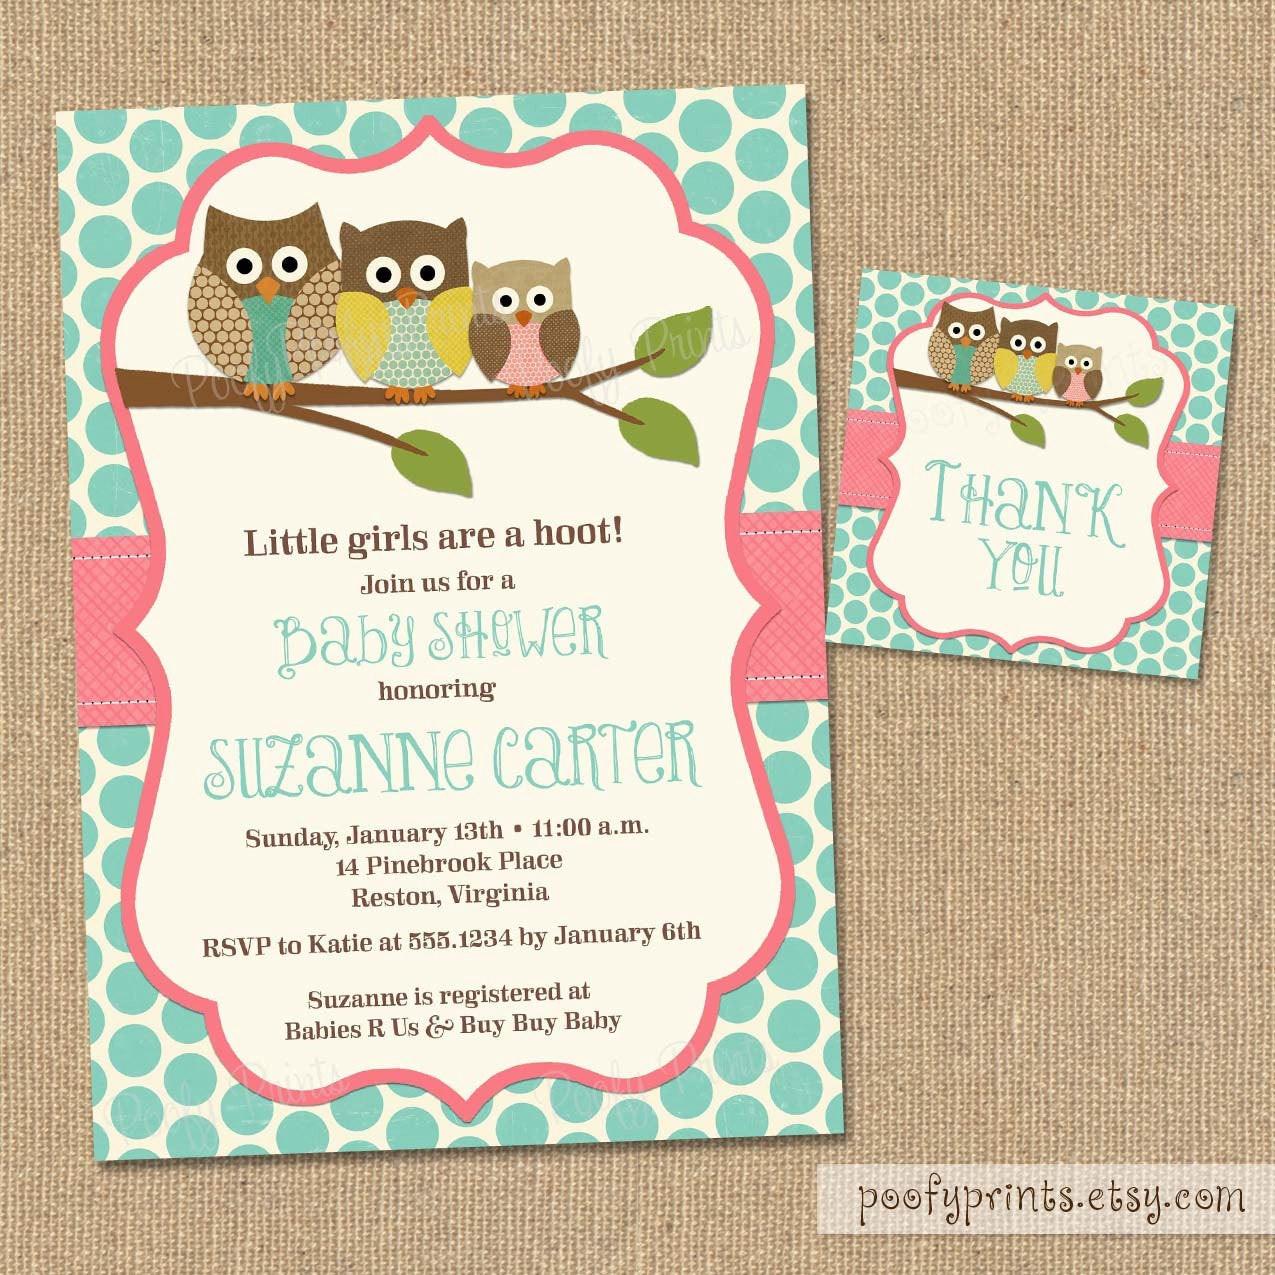 DIY Baby Shower Invitations Free  Owl Baby Shower Invitations DIY Printable Baby Girl Shower